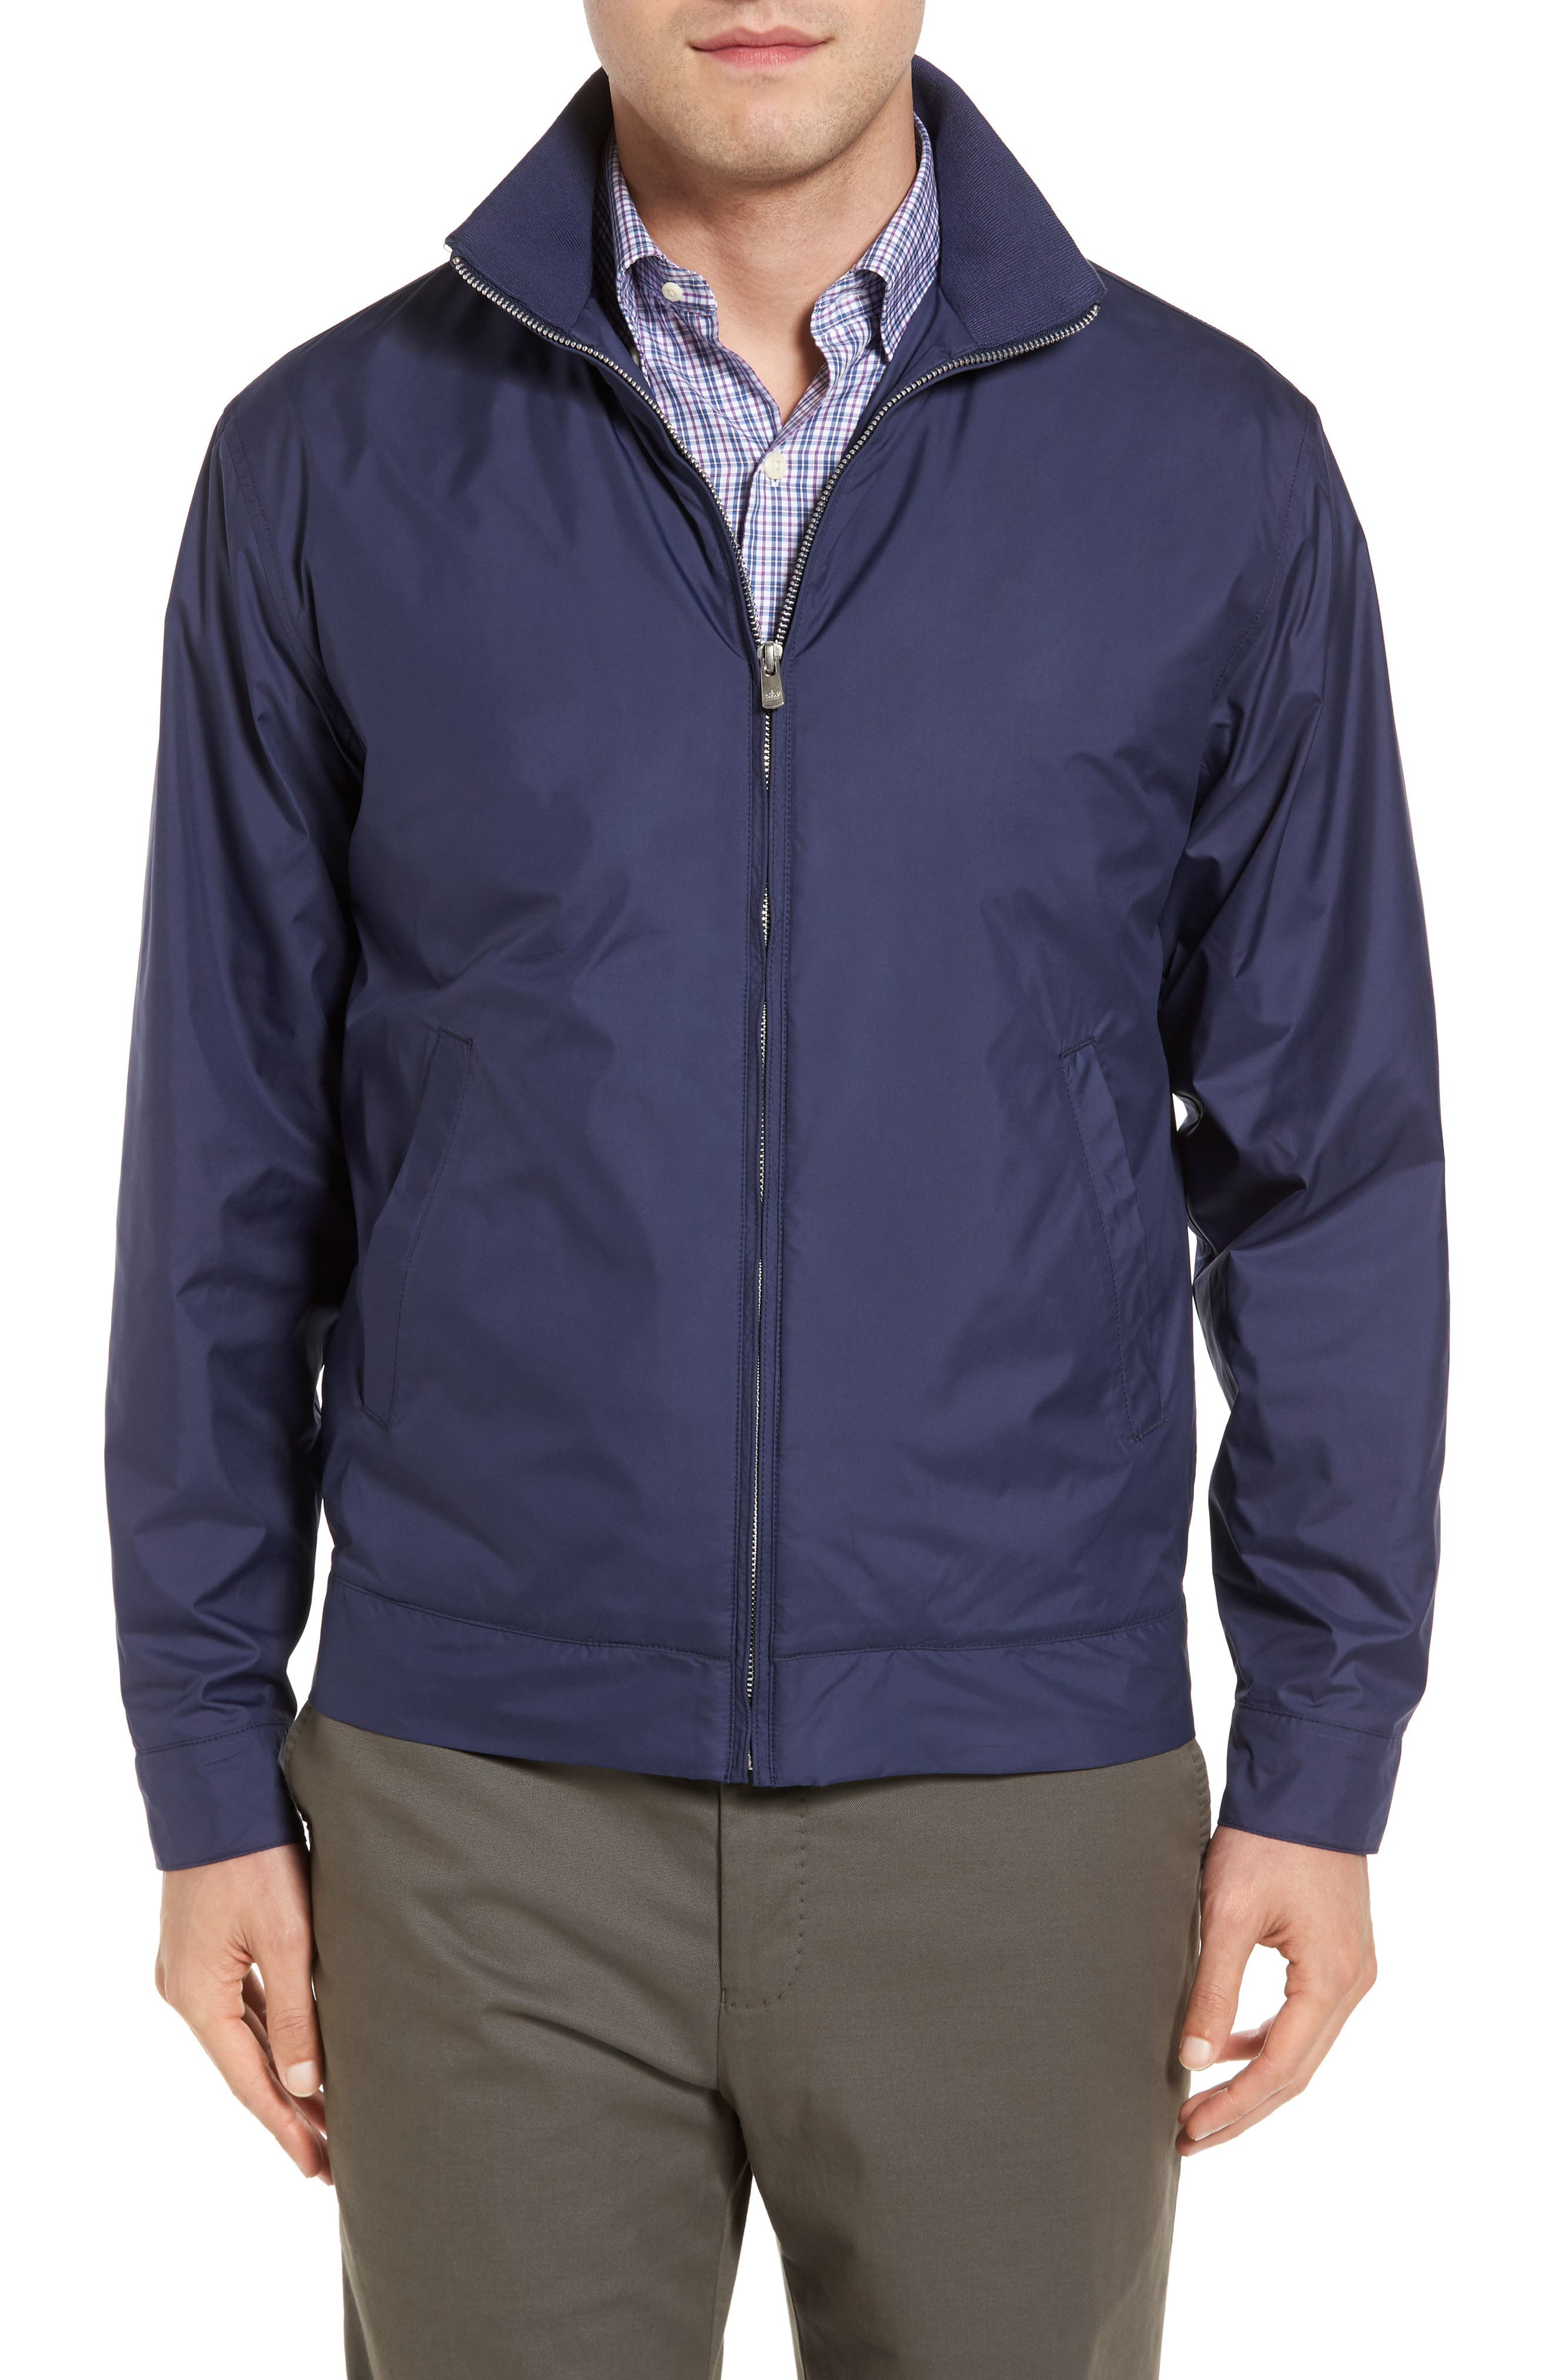 Navy Small Men/'s Reversible Water-Resistant Hooded Jacket Beige